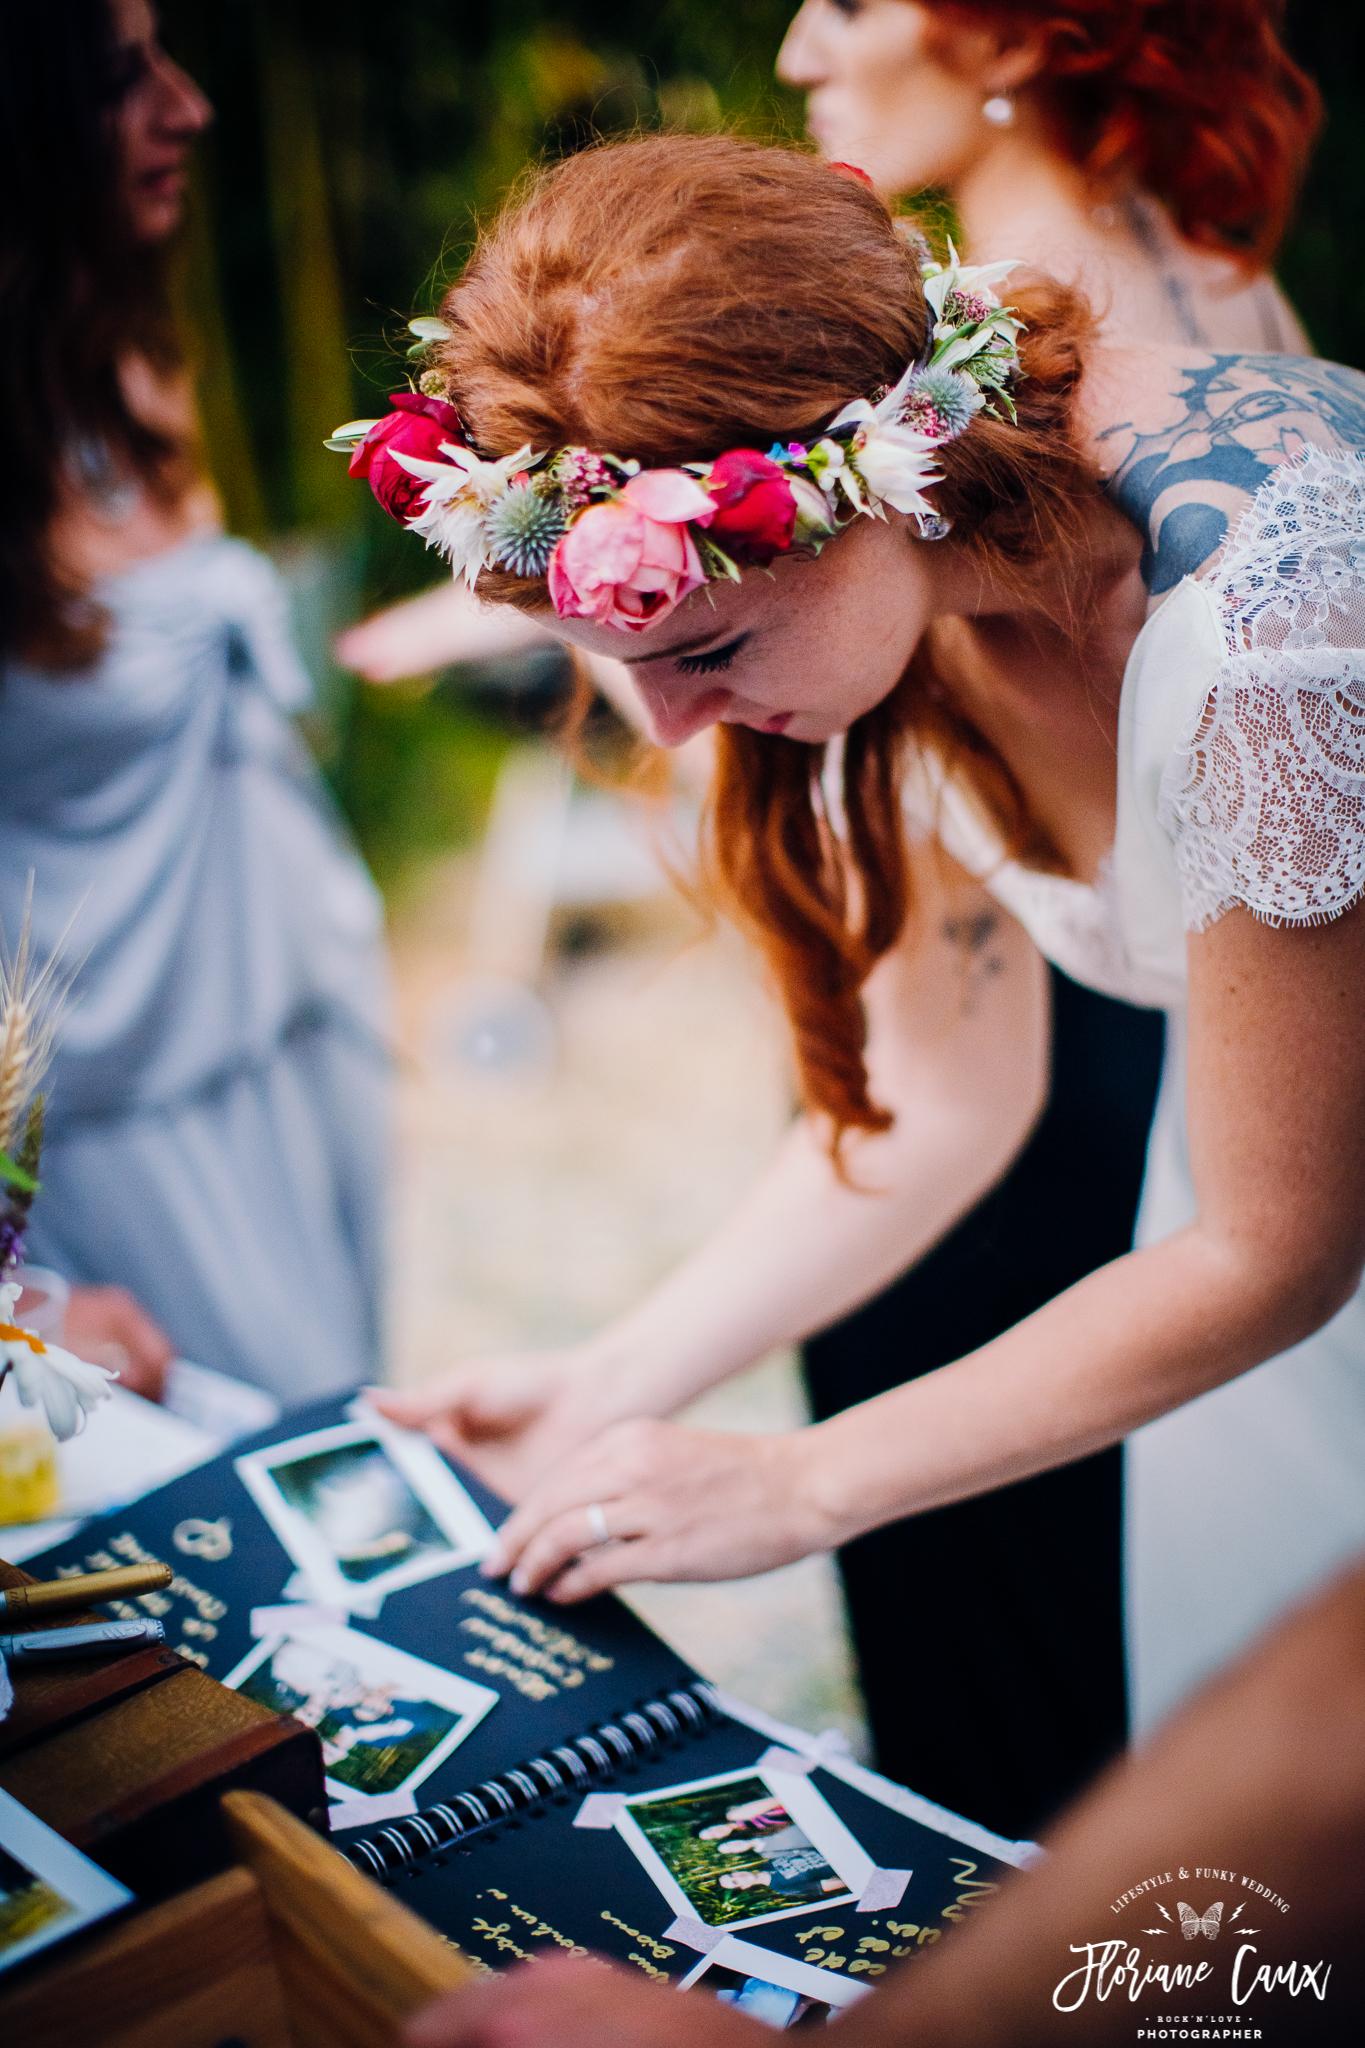 photographe-mariage-toulouse-rocknroll-maries-tatoues-floriane-caux-115